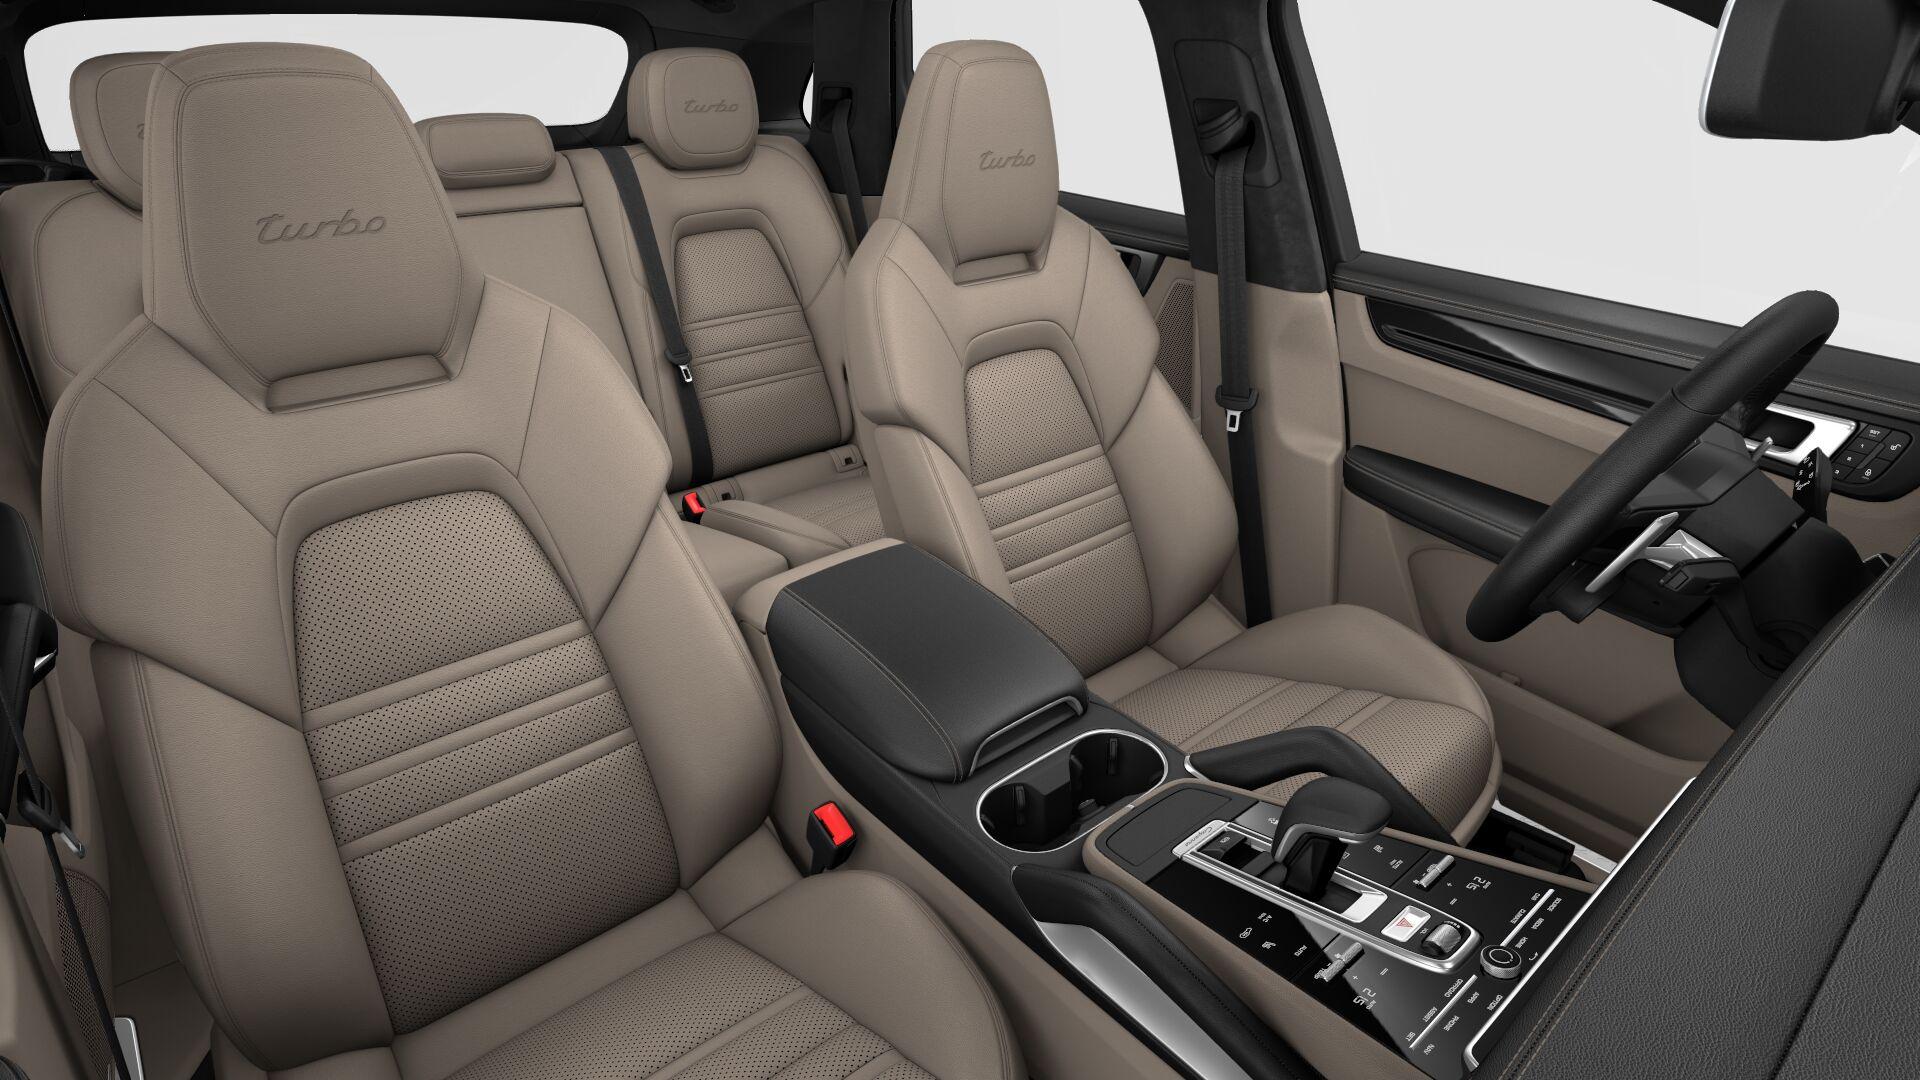 sport luxury rome aaa new hire classe amg rent mercedes rental s ferrari car